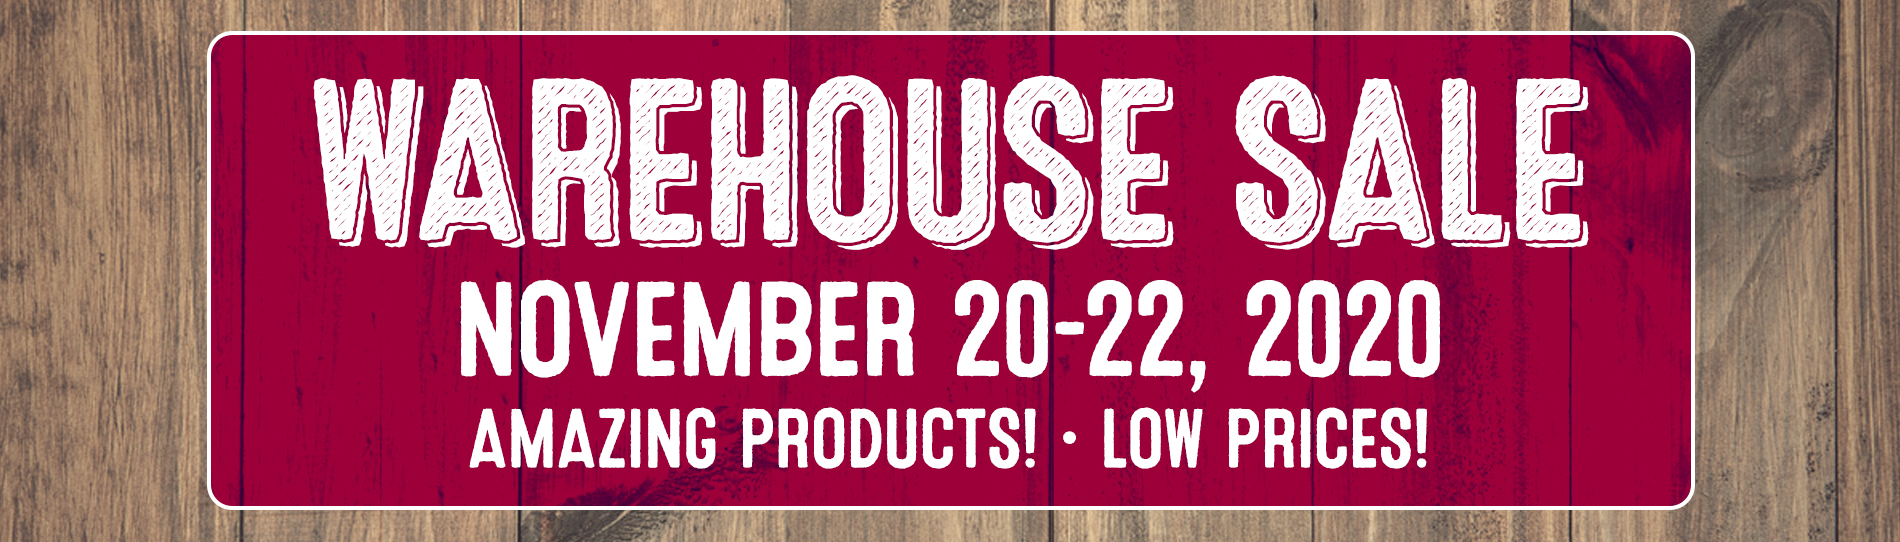 Warehouse Sale November 20-22-2020 banner